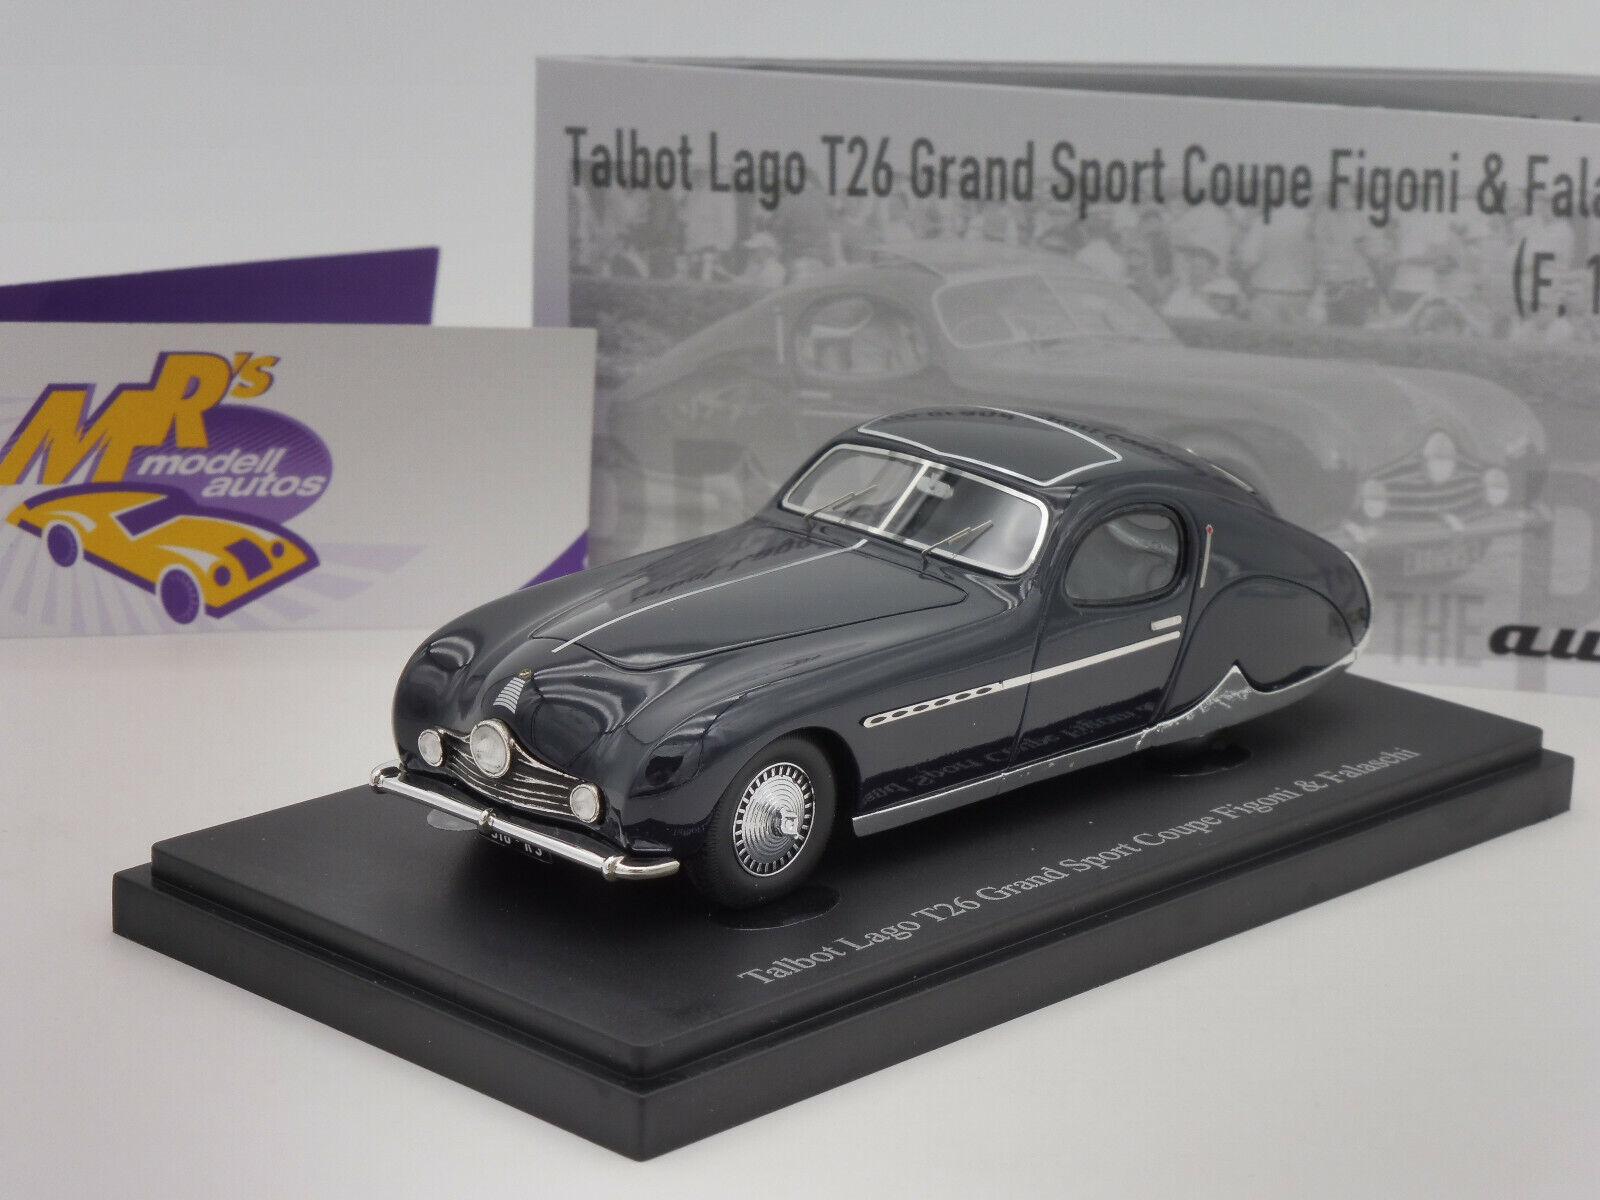 Autocult 02019 Talbot Lago T26 Grand Sport Coupe Year 1949  Dark bluee  1 43